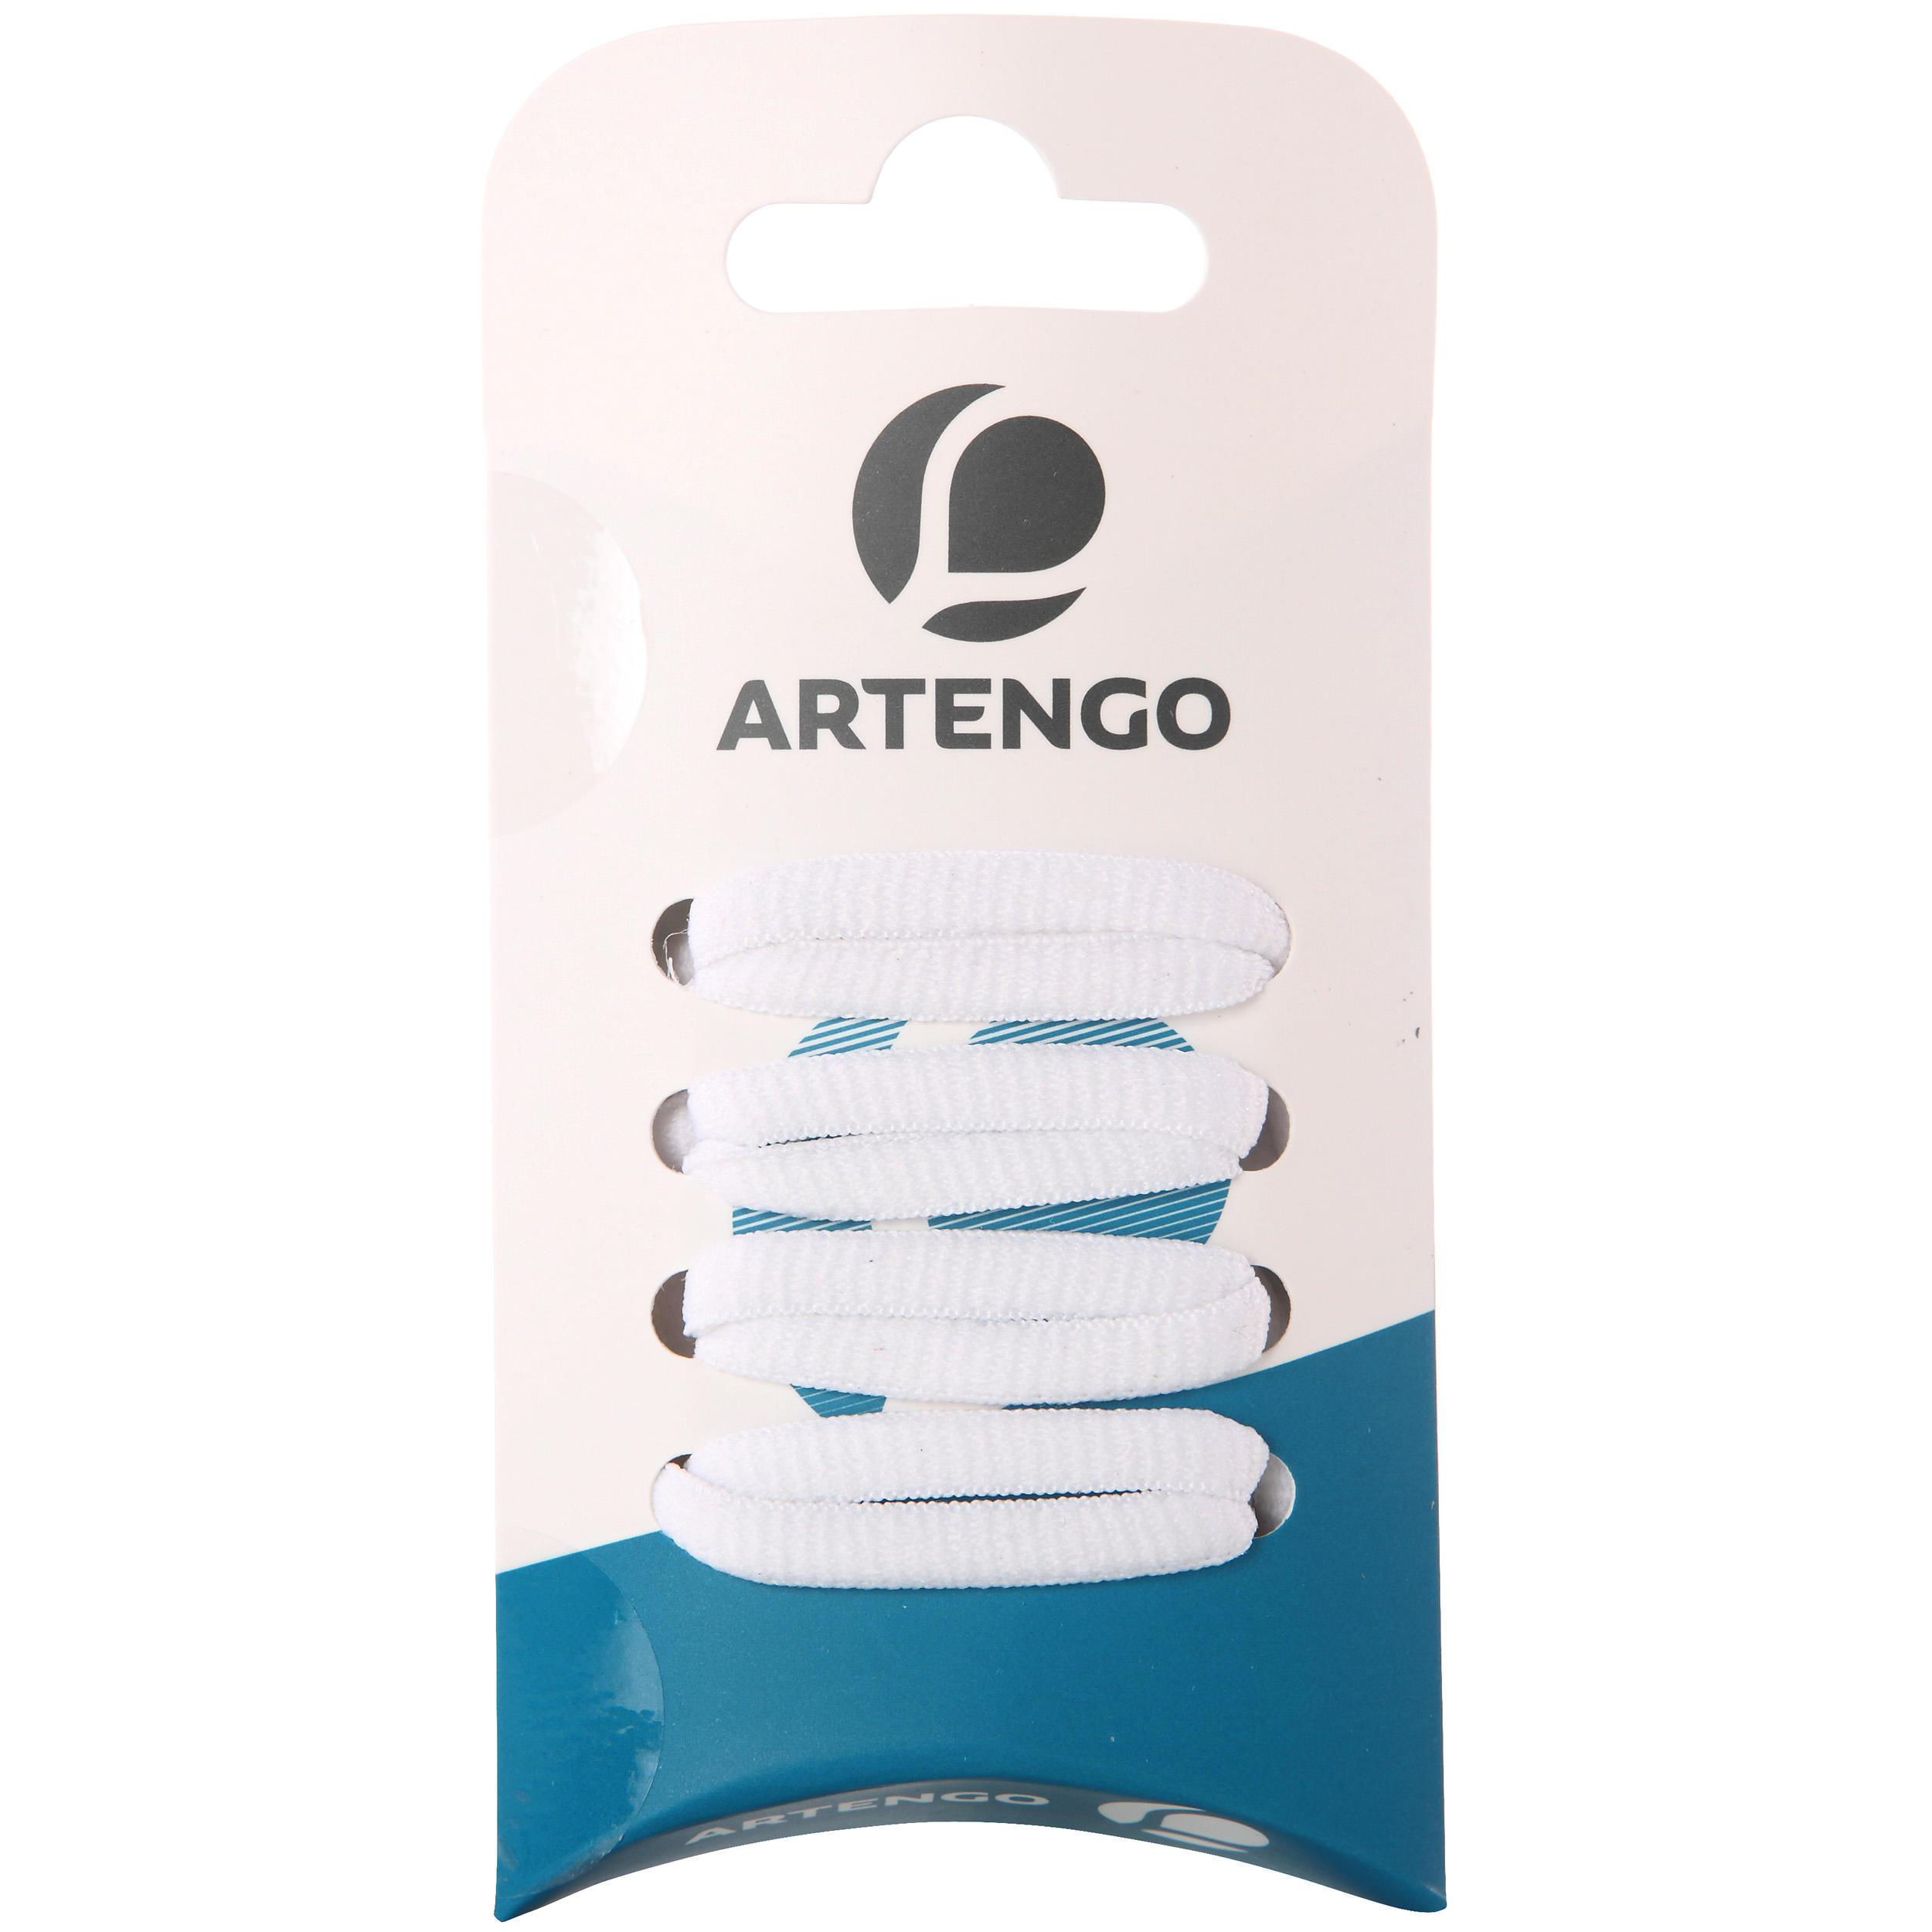 Oval Laces - White - 110 CM By ARTENGO | Decathlon